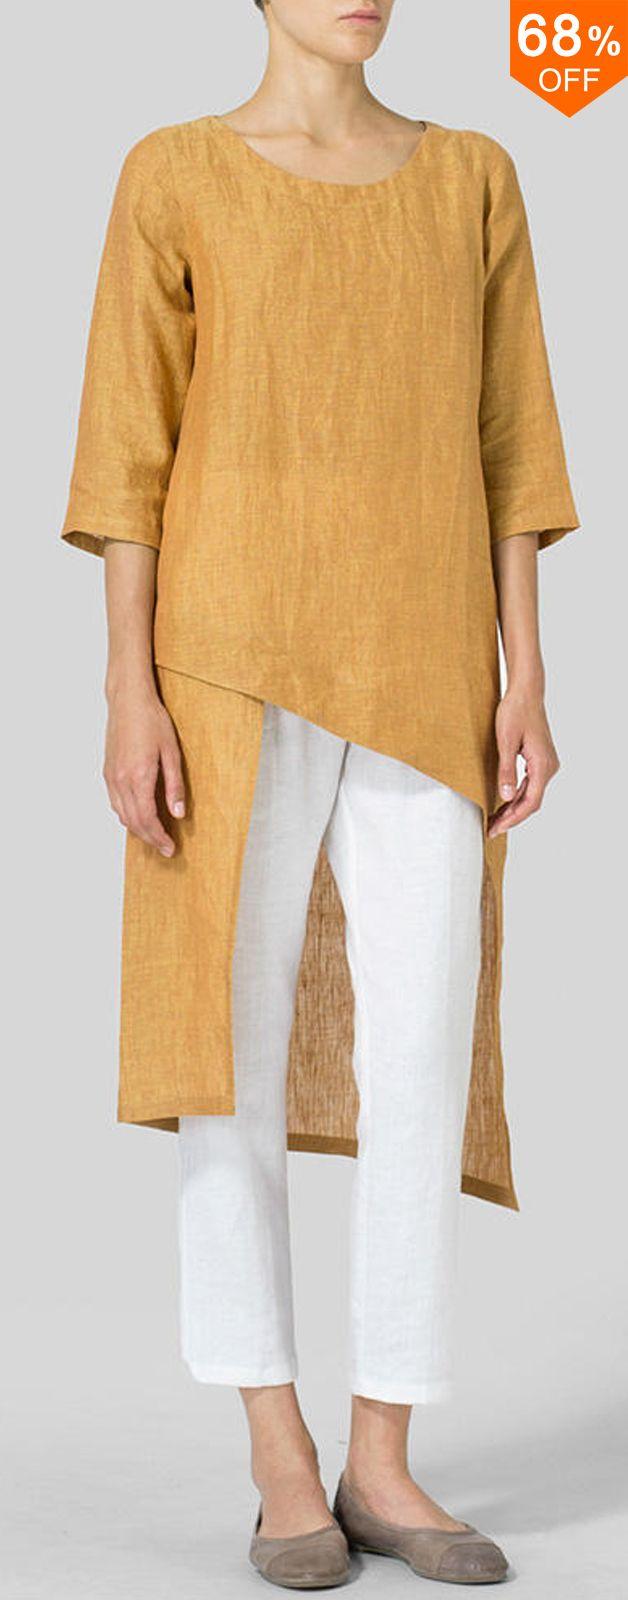 68% off&Free shipping.Plus Size Elegant 3/4 Sleeve Irregular Hem Women Blouse